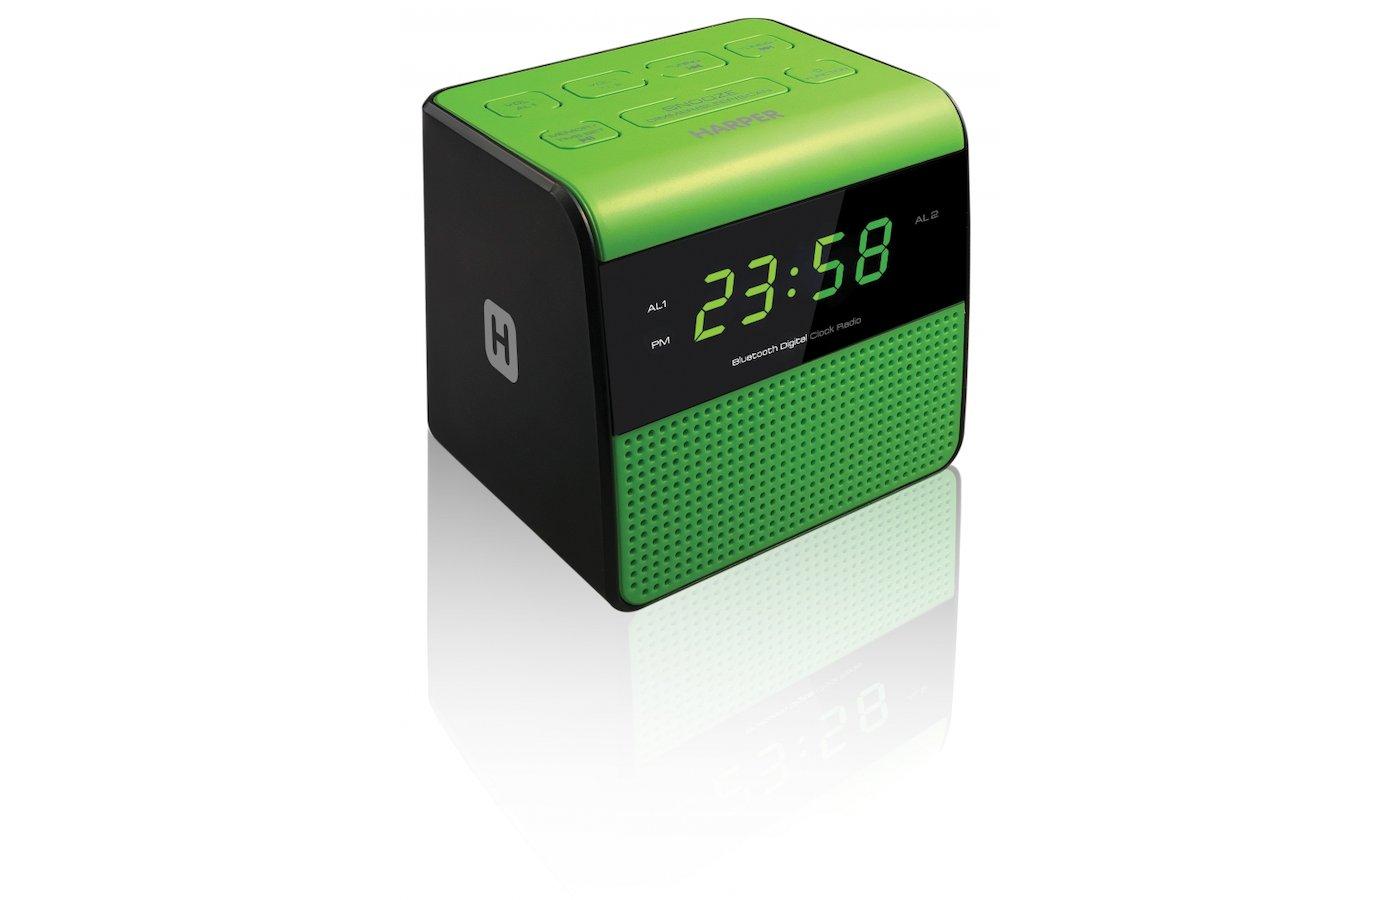 Настольные часы HARPER HRCB-7768 Радиобудильник с блютуз